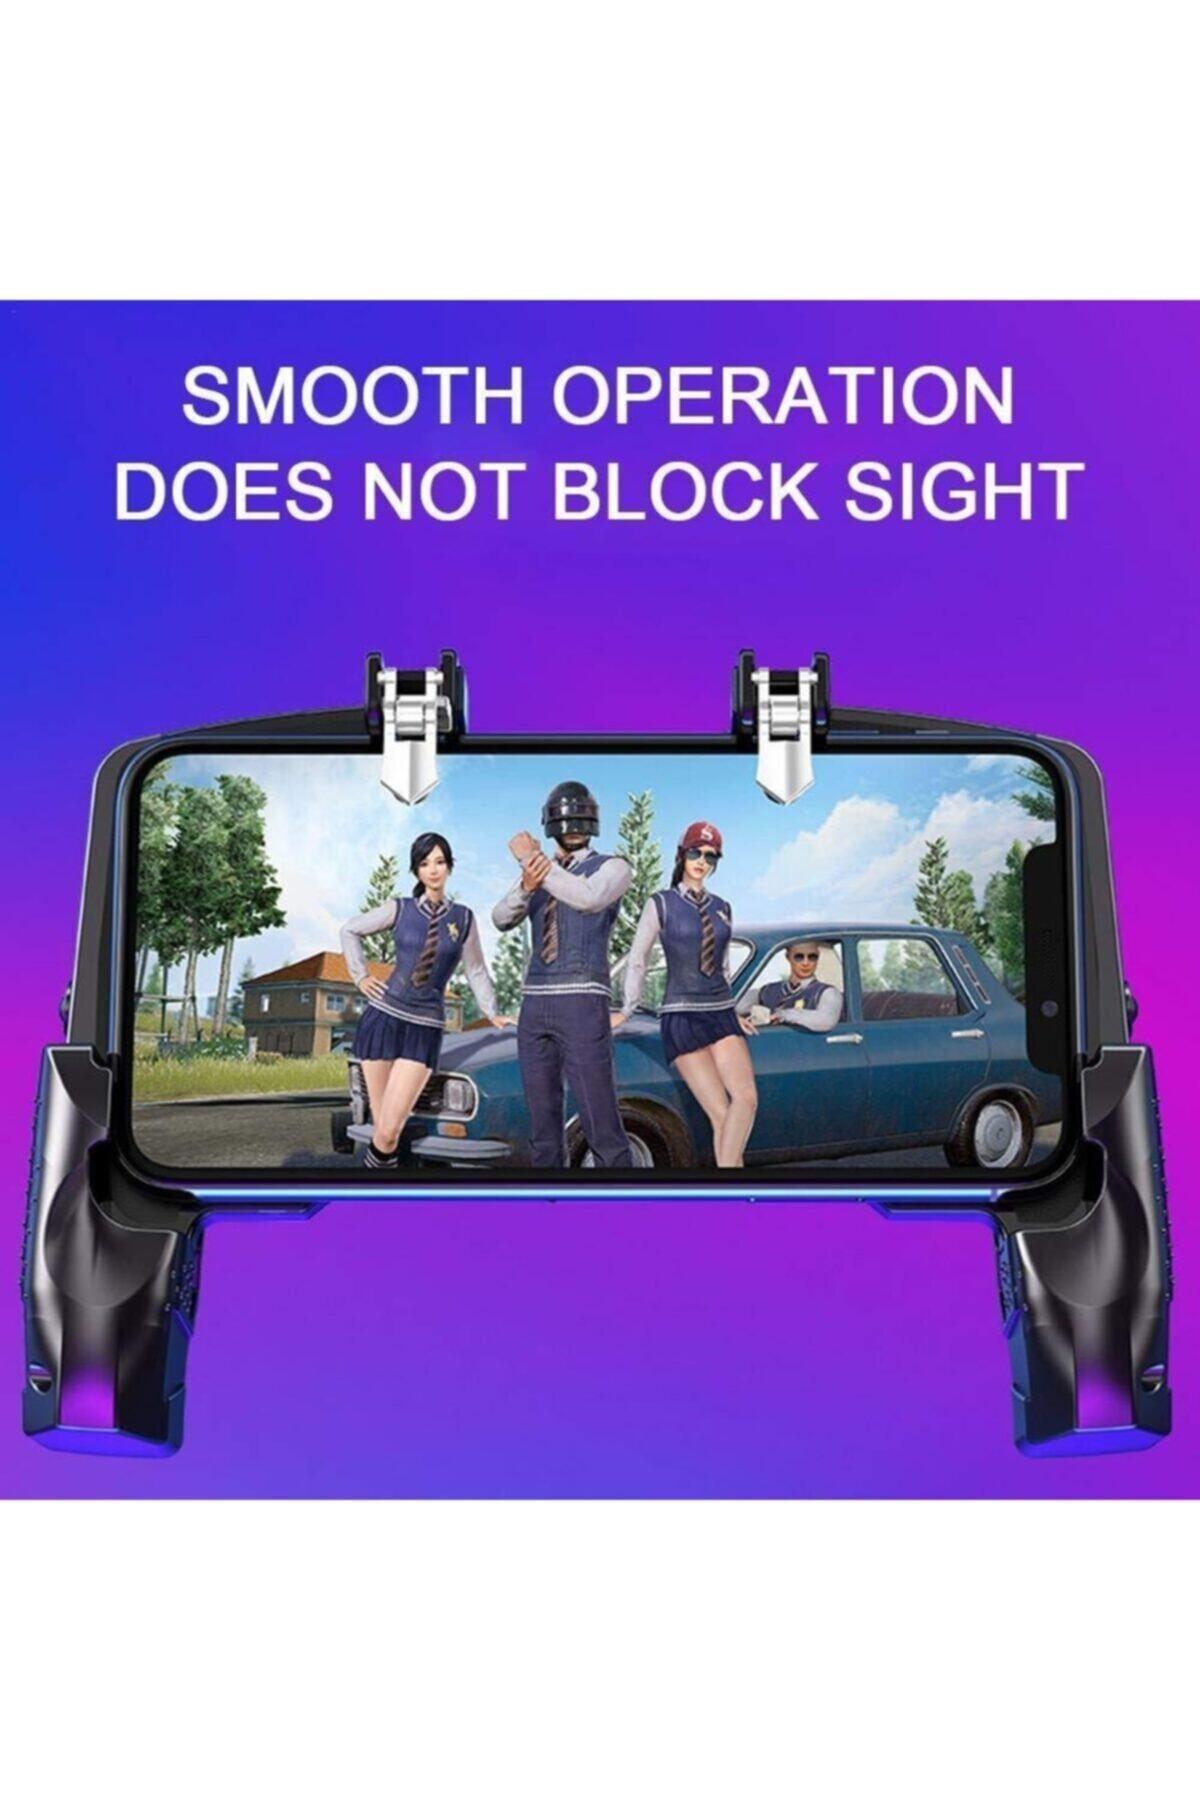 Aydurmaz Silah Kabzası Tasarım Pubg Mobil Game Oyun Aparatı Konsolu 2